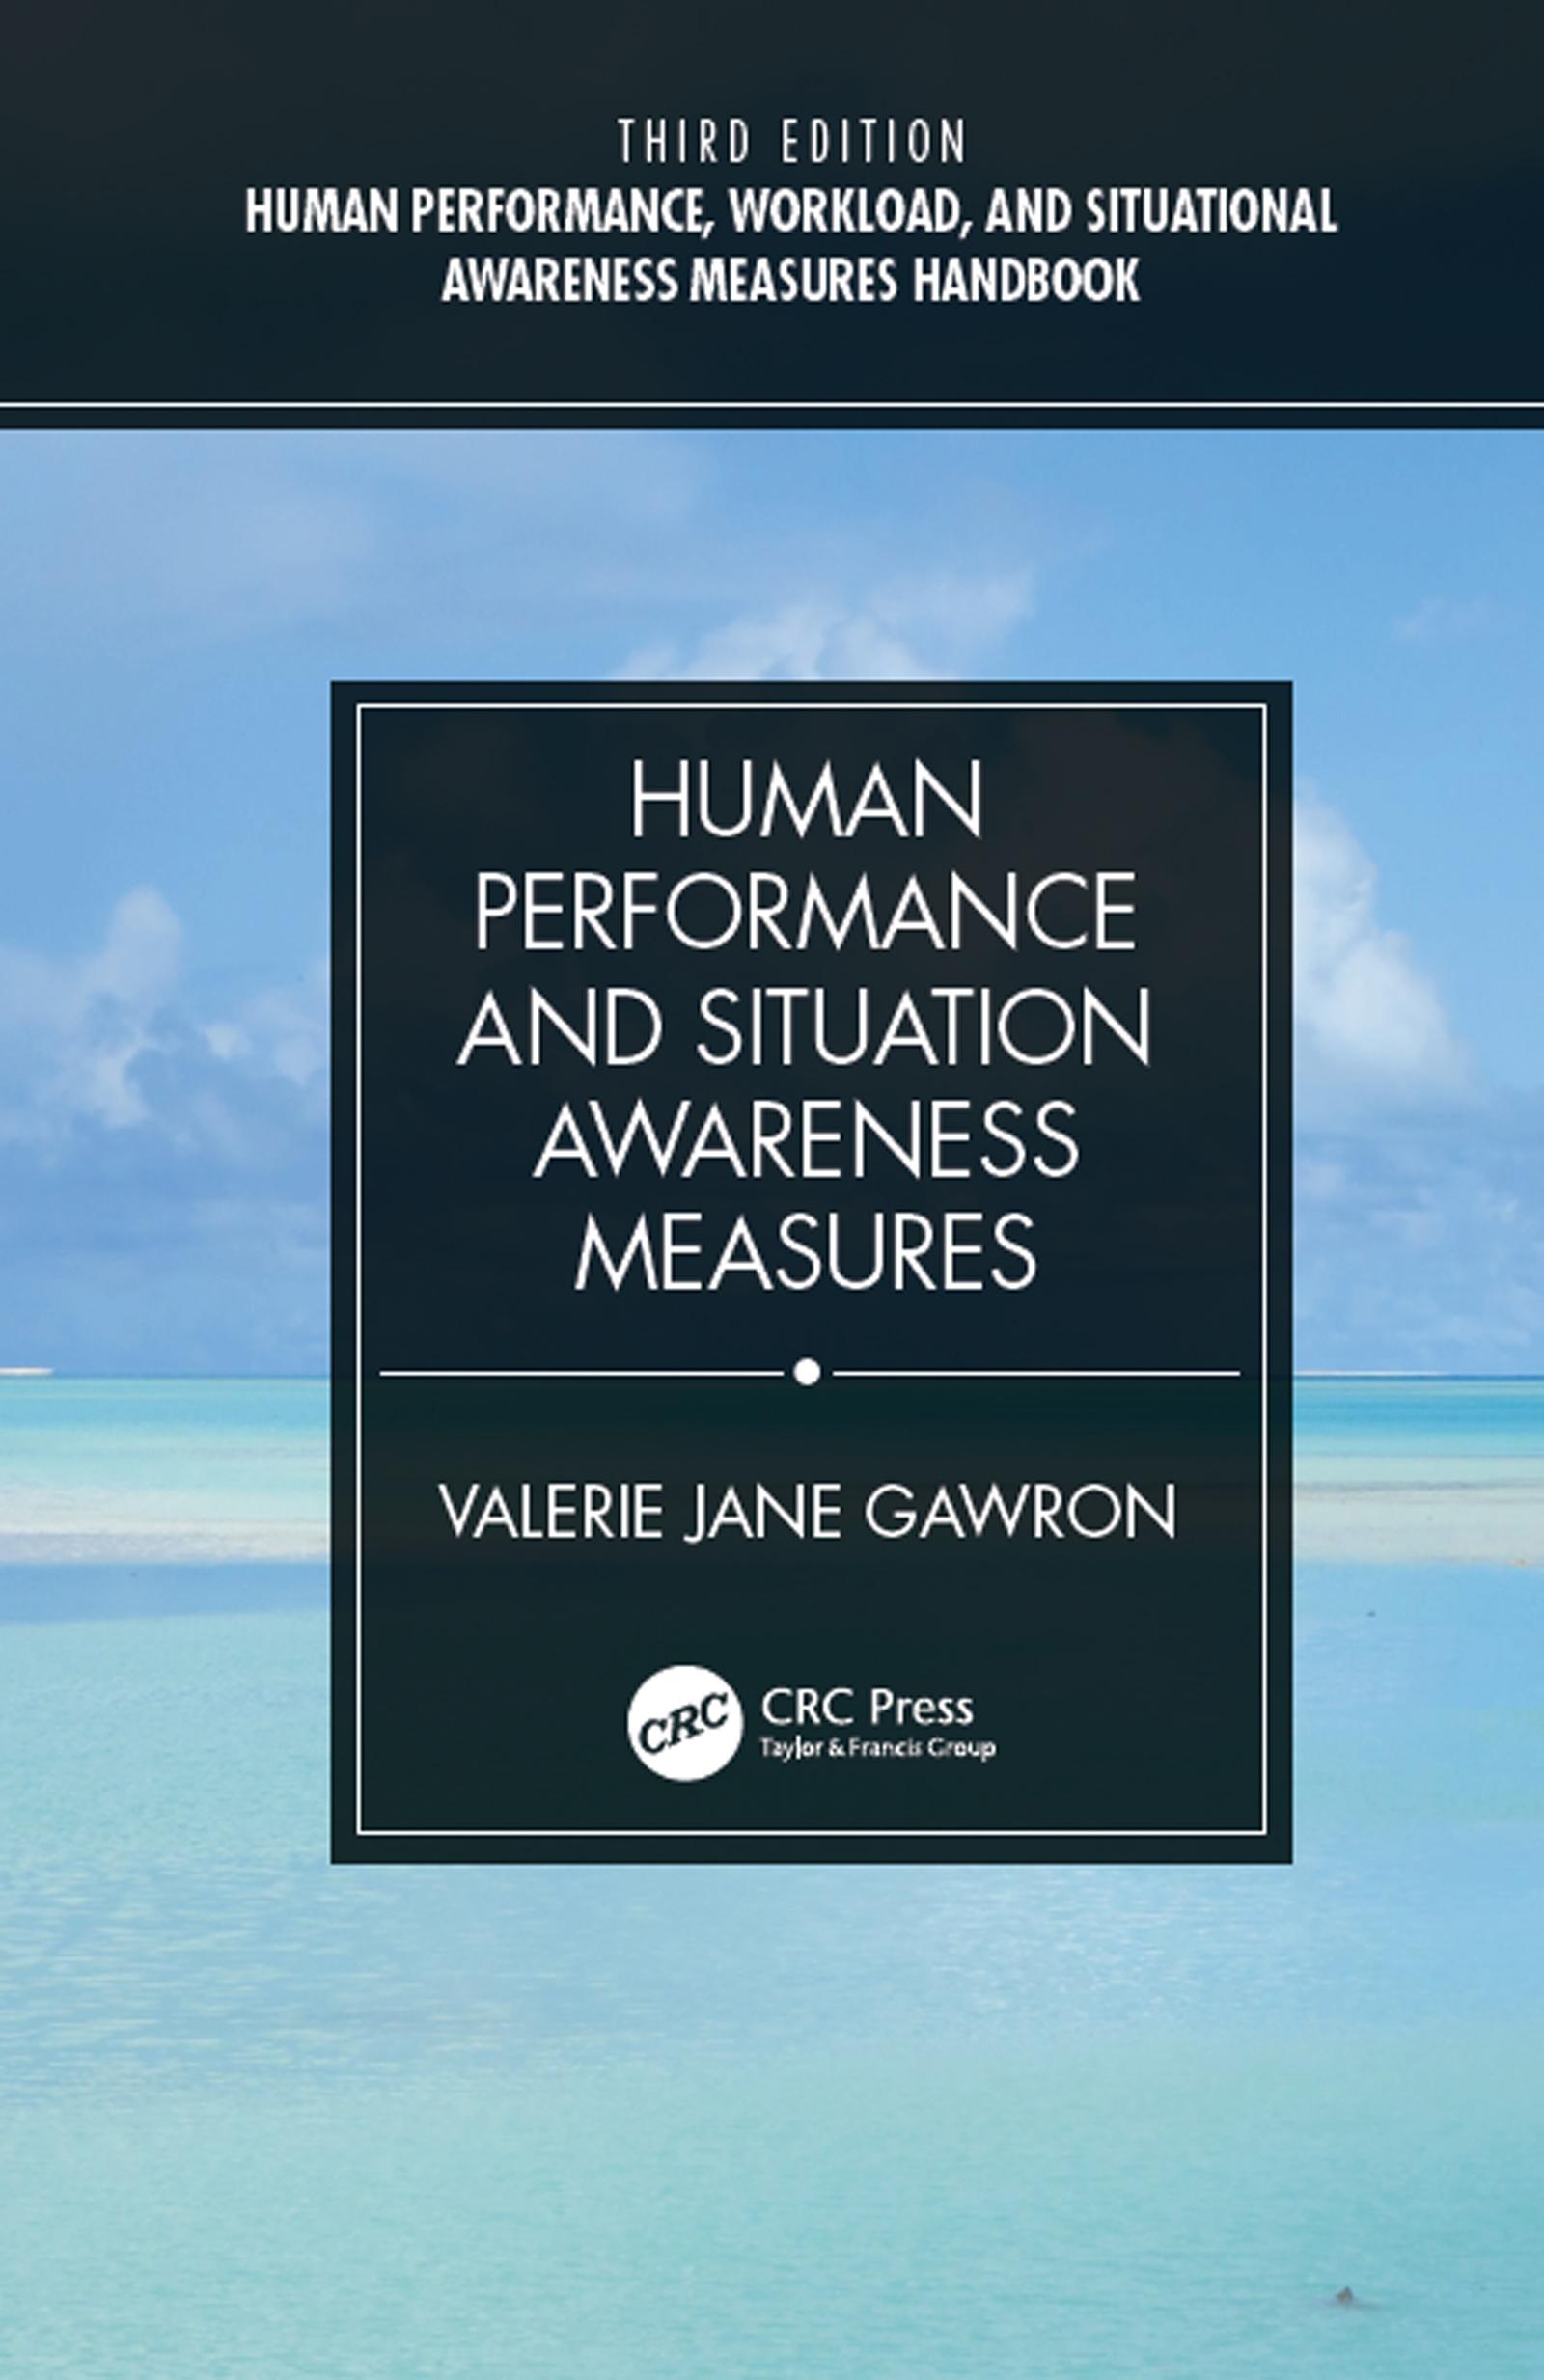 Human Performance, Workload, and Situational Awareness Measures Handbook, Third Edition - 2-Volume Set book cover